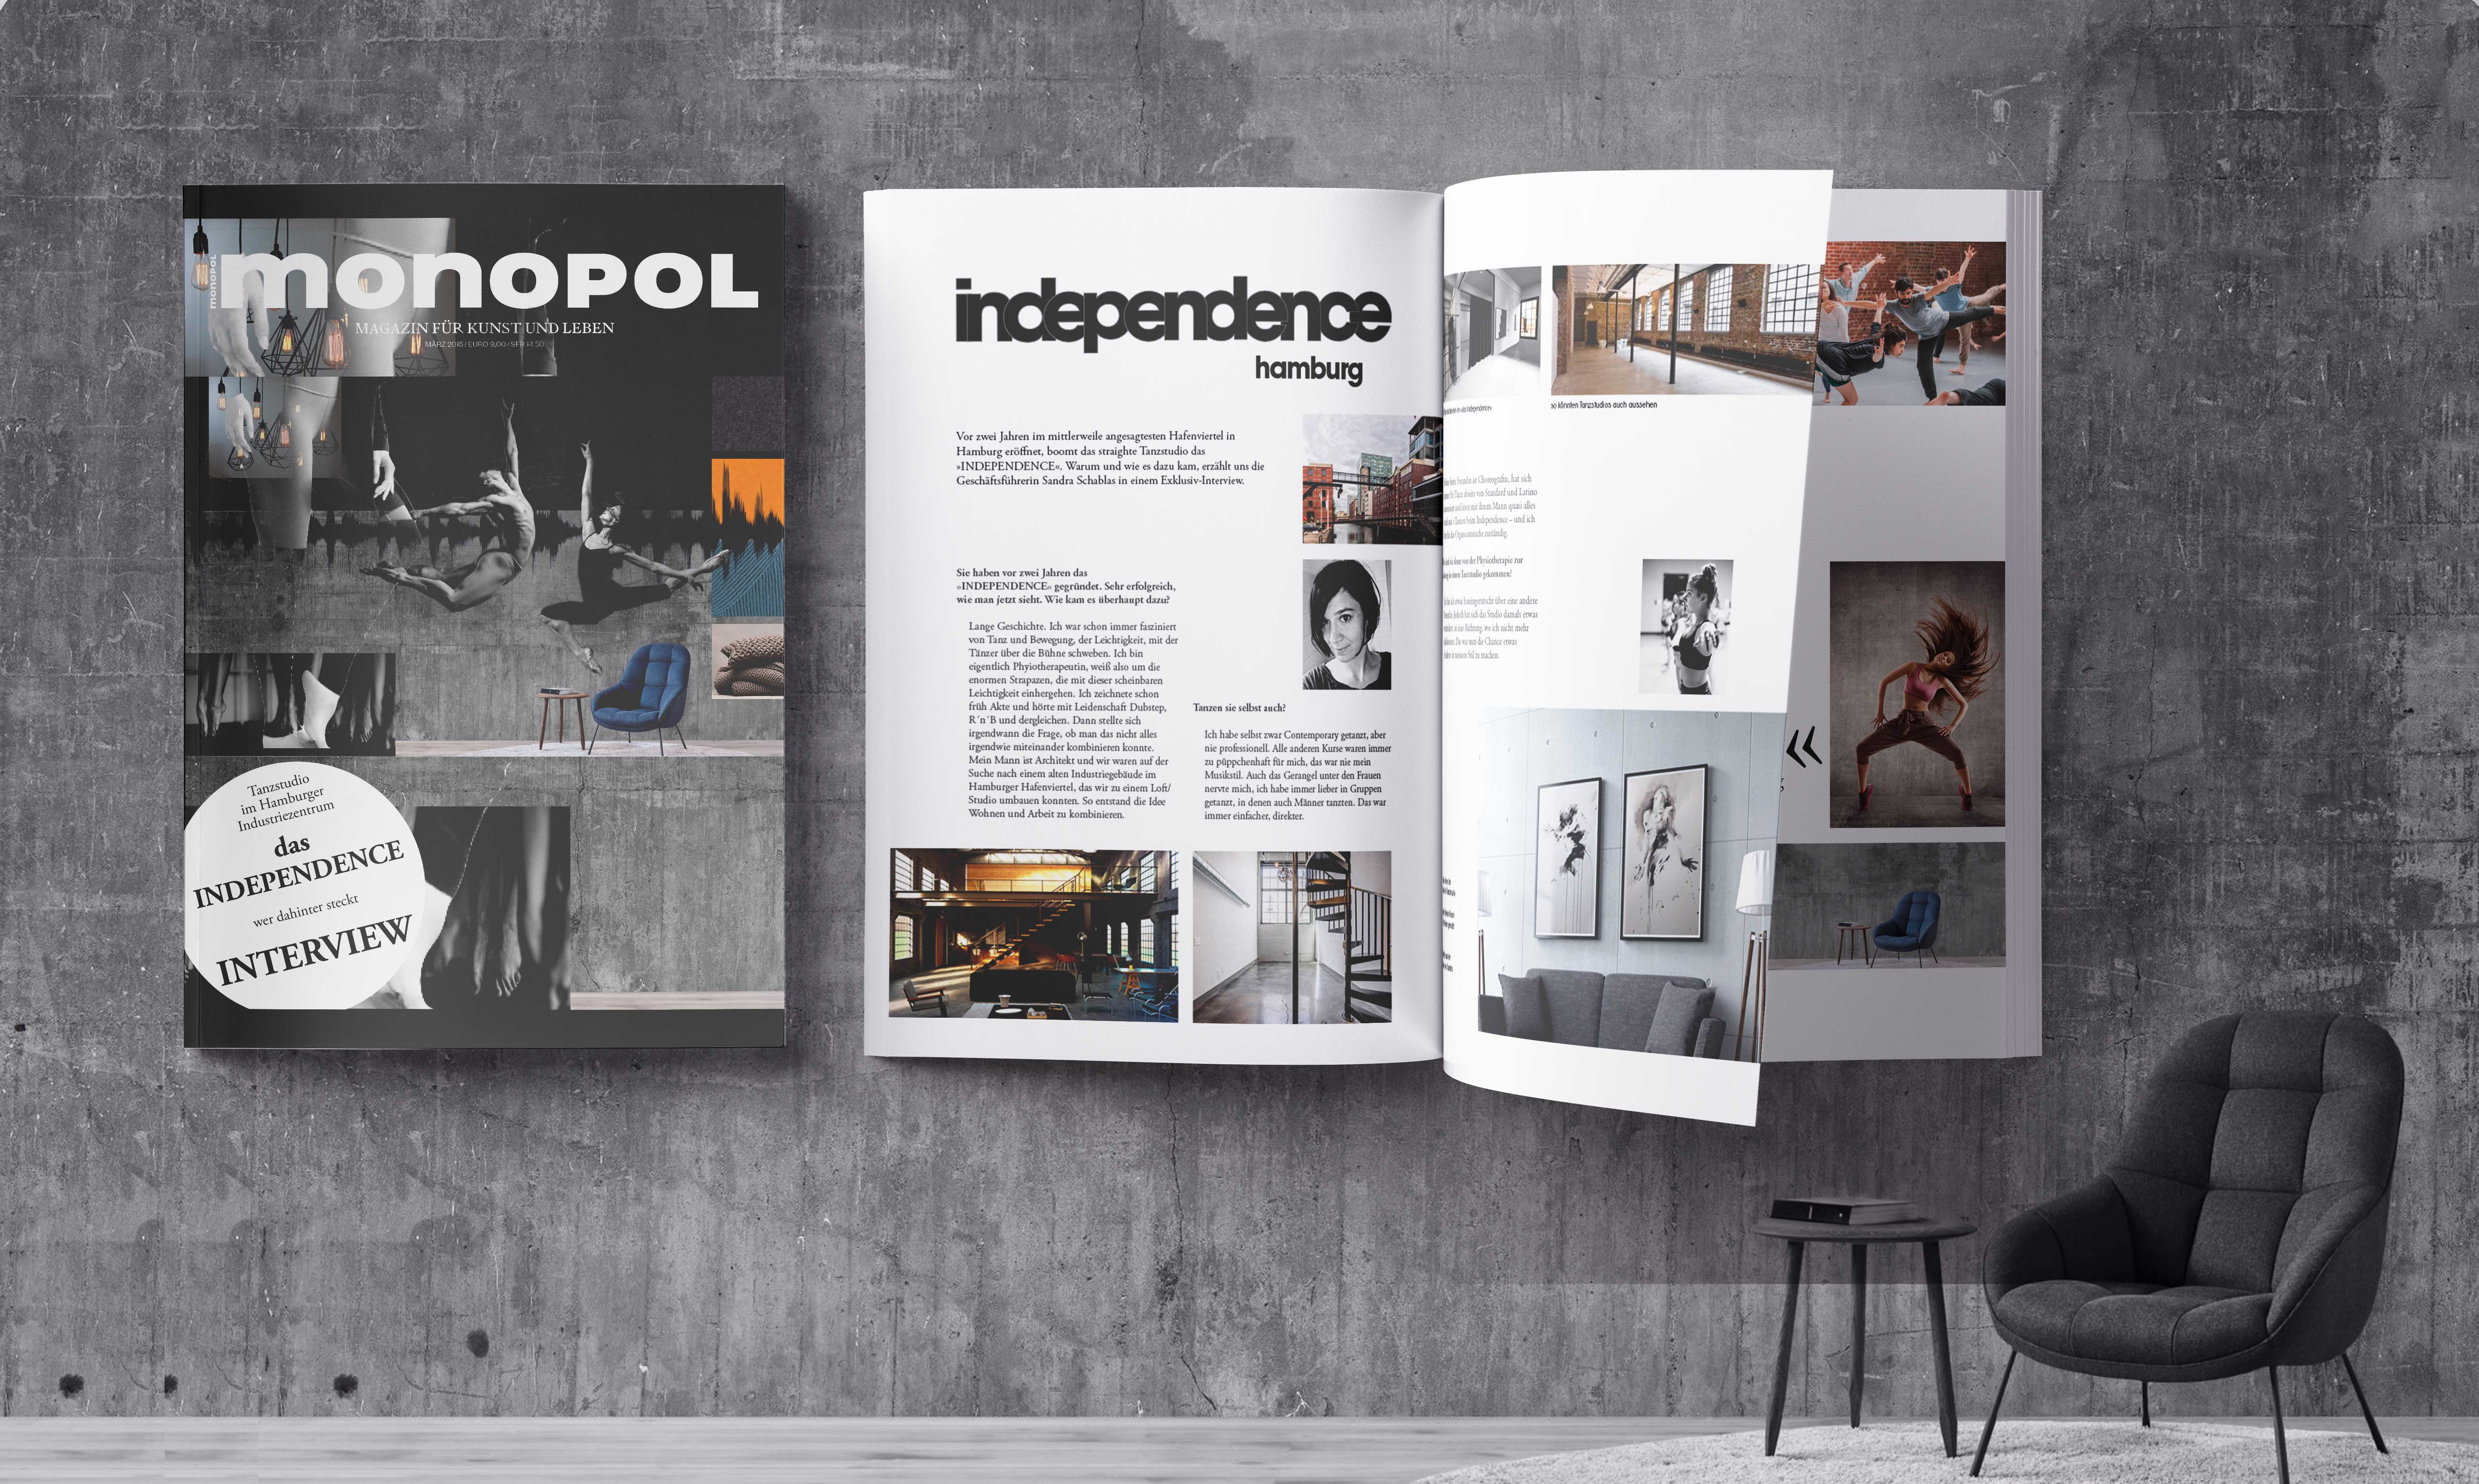 MagazineMockup_Monopol